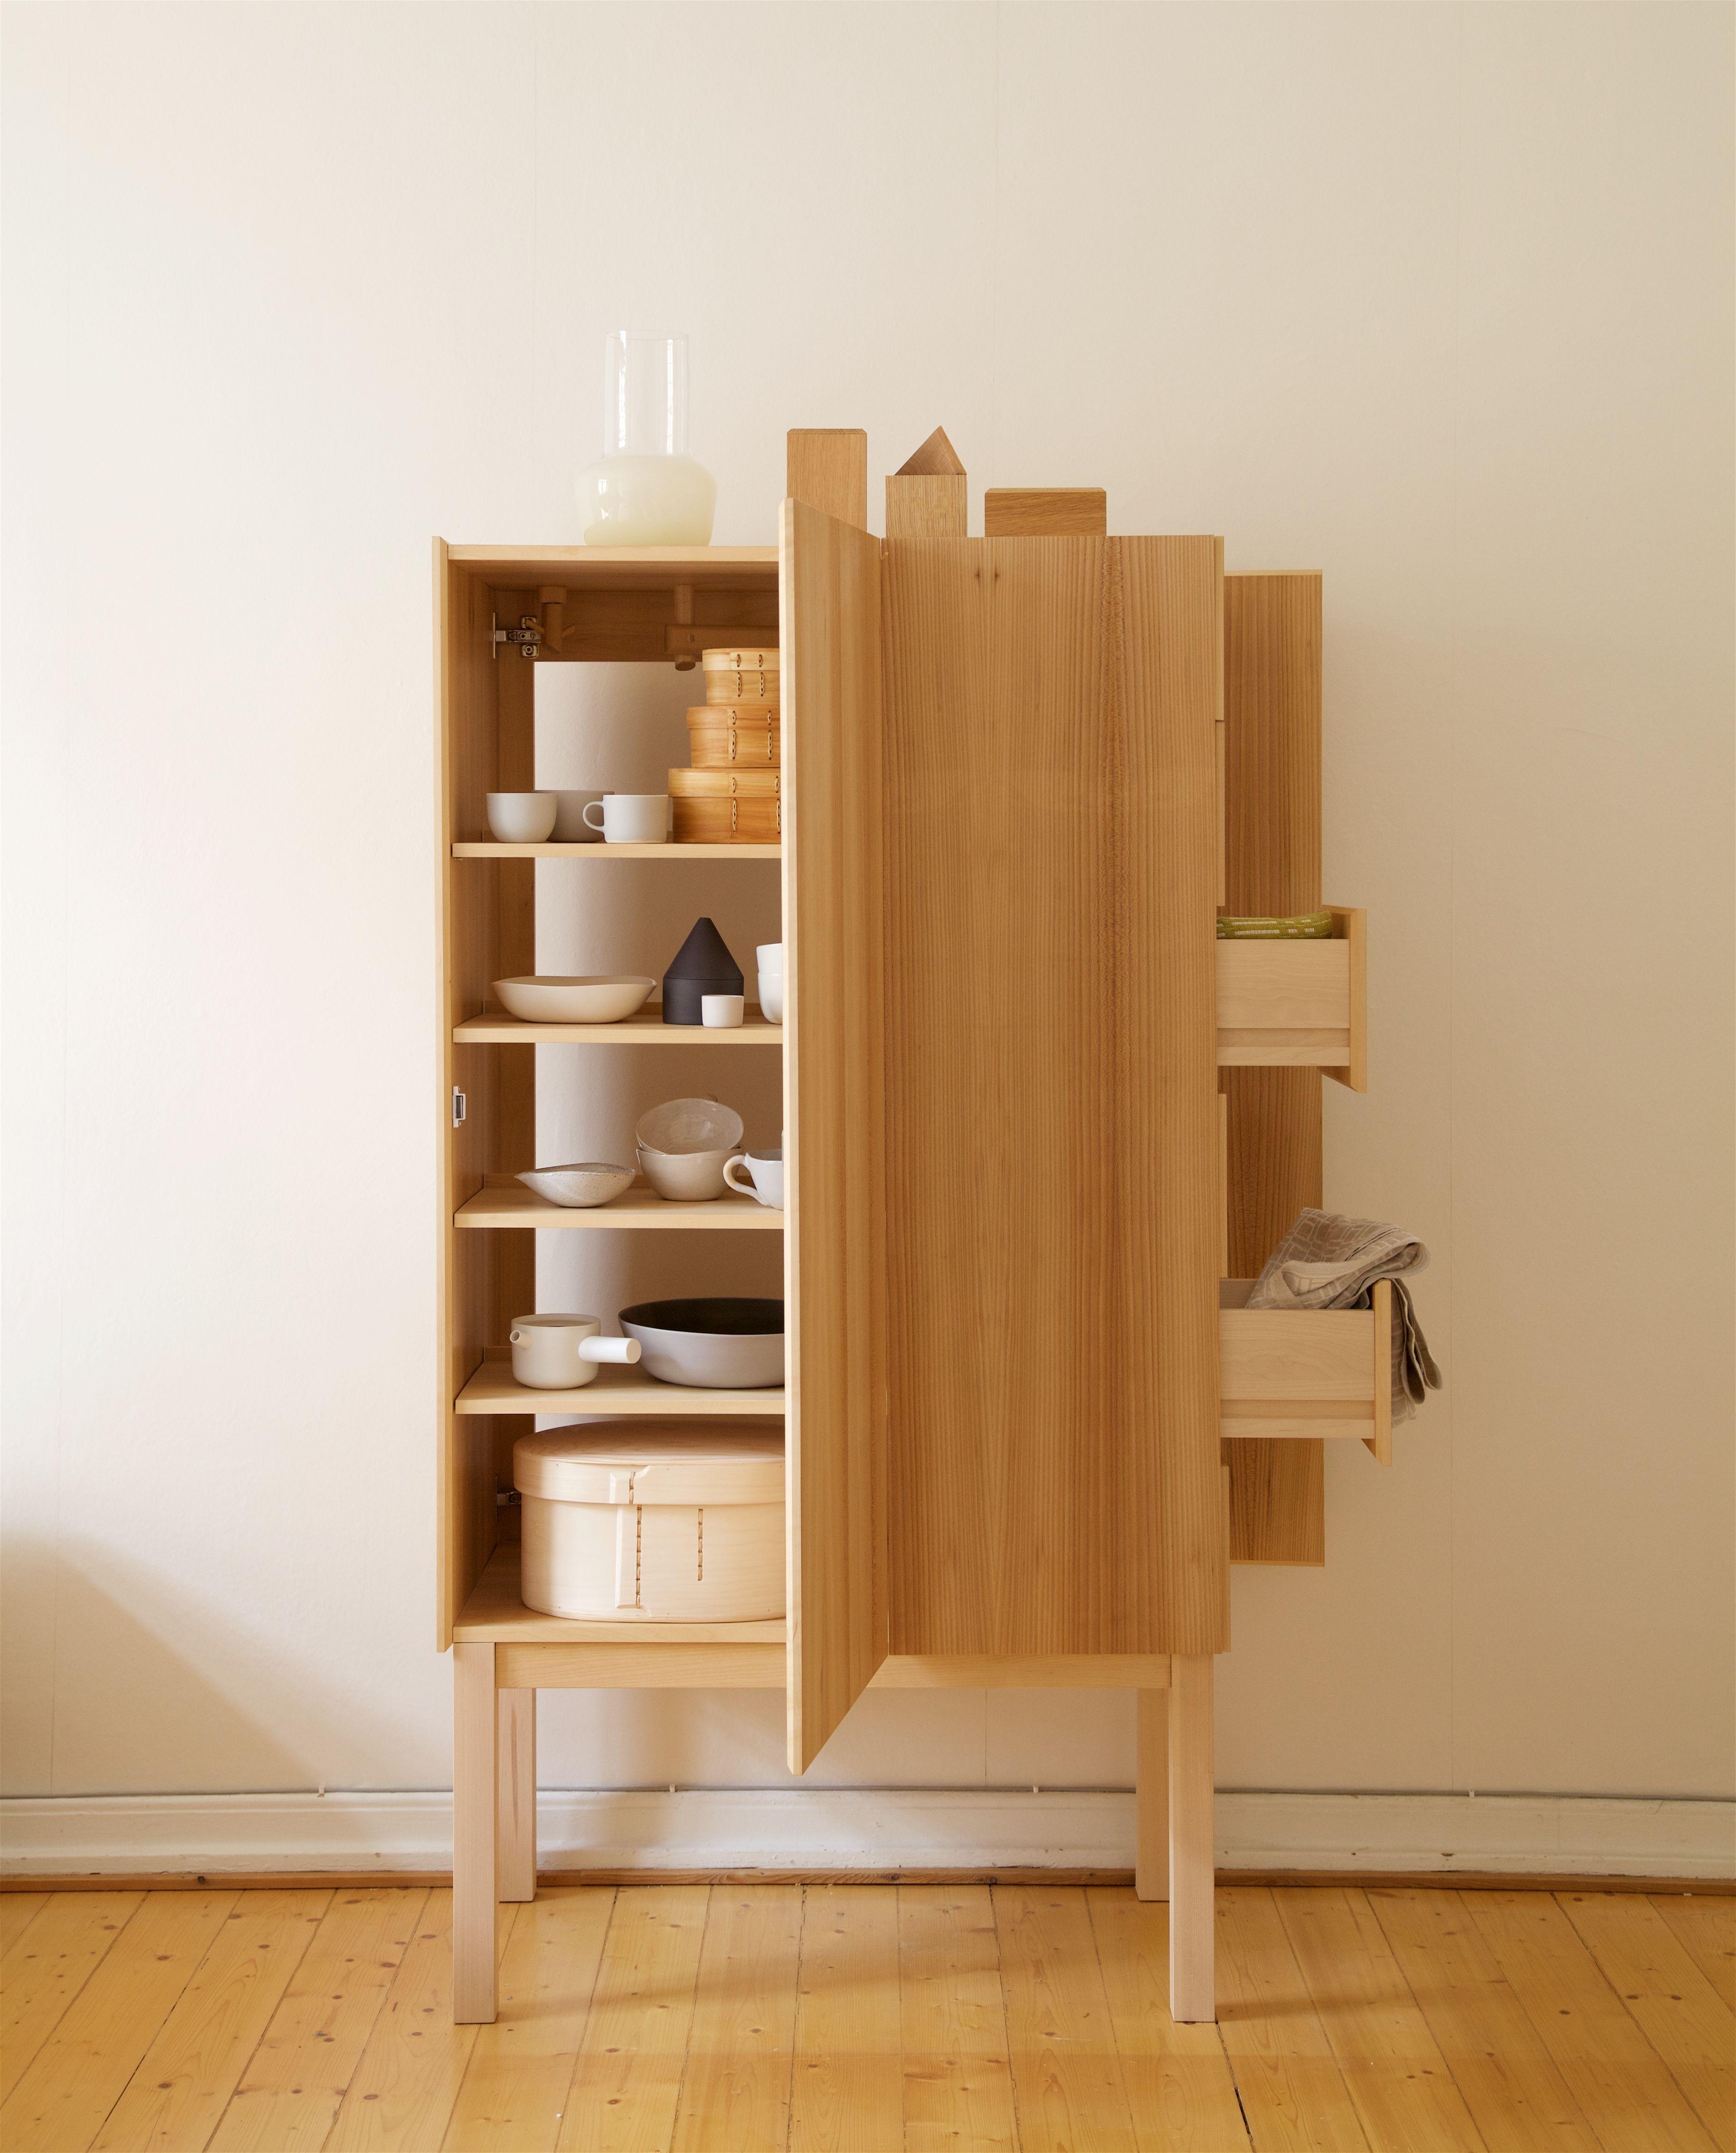 Lokal Helsinki Avata Cabinet By Hanni Koroma Scandinavian Furniture Design Scandinavian Furniture Furniture